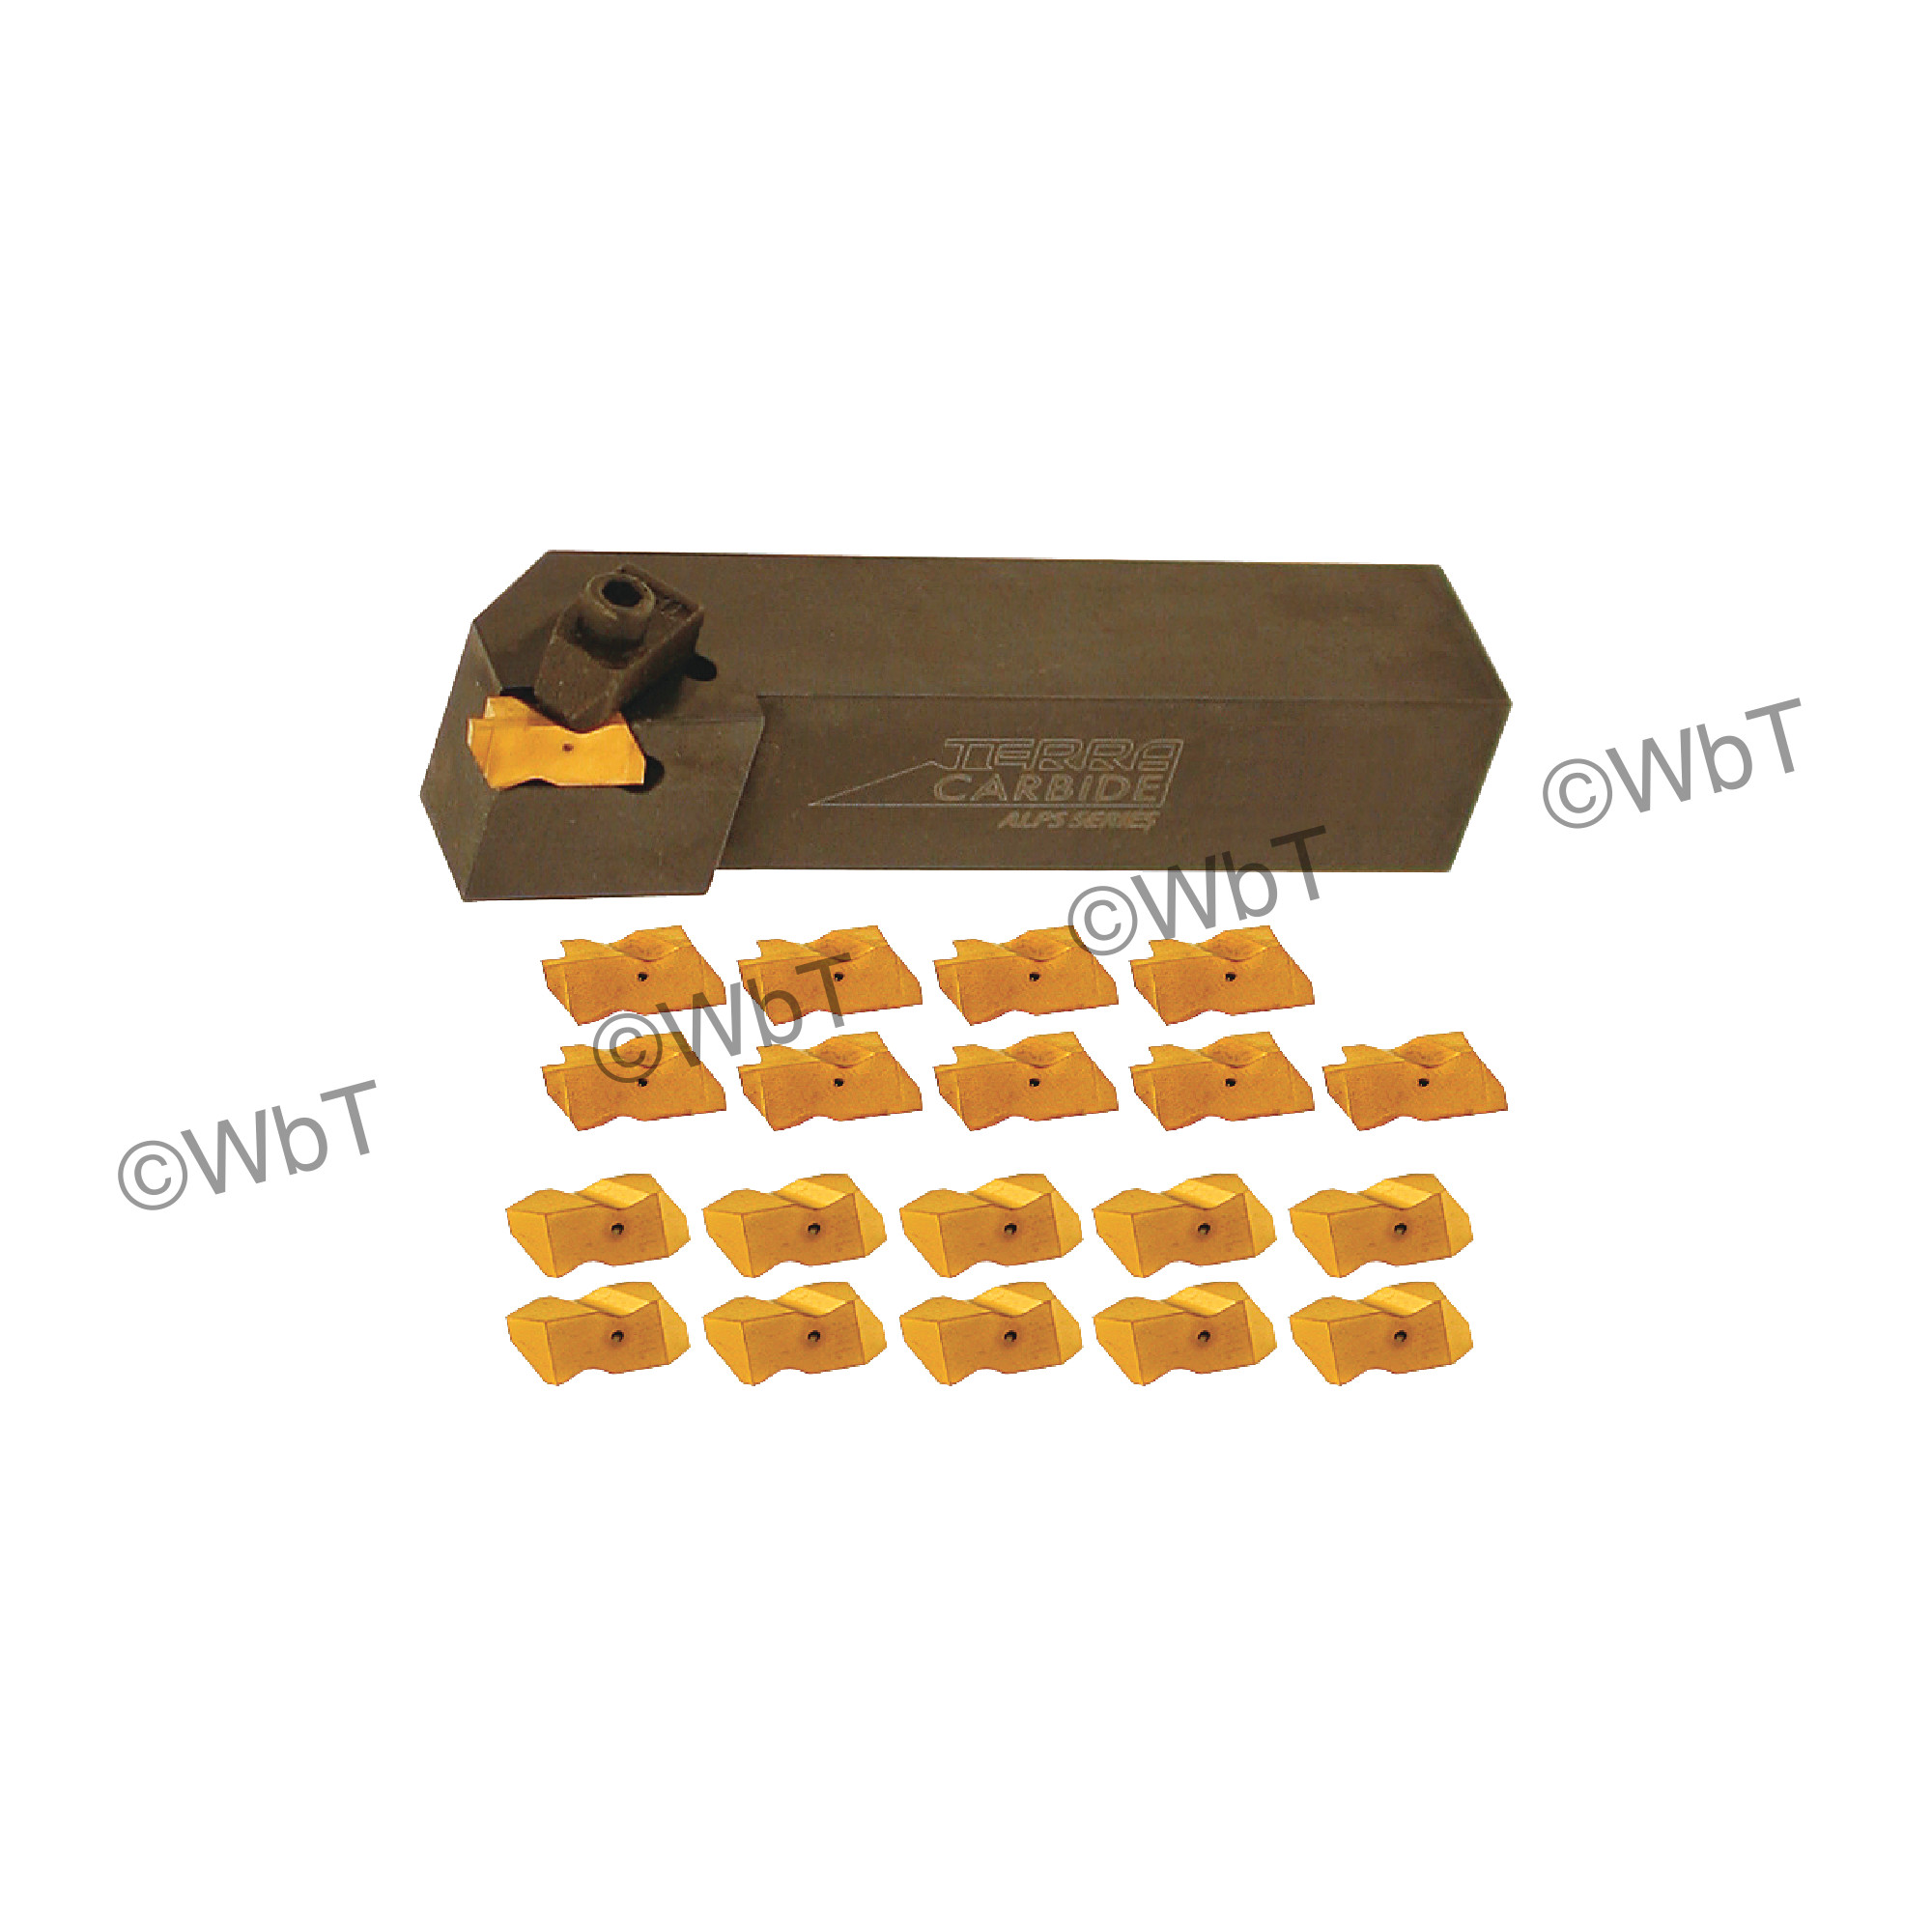 "TERRA CARBIDE - TNSR16-2D / 1.000"" Shank External Holder Sets with (10) TNG 2031R APC5T Inserts & (10) TNT2R APC5T Inser"